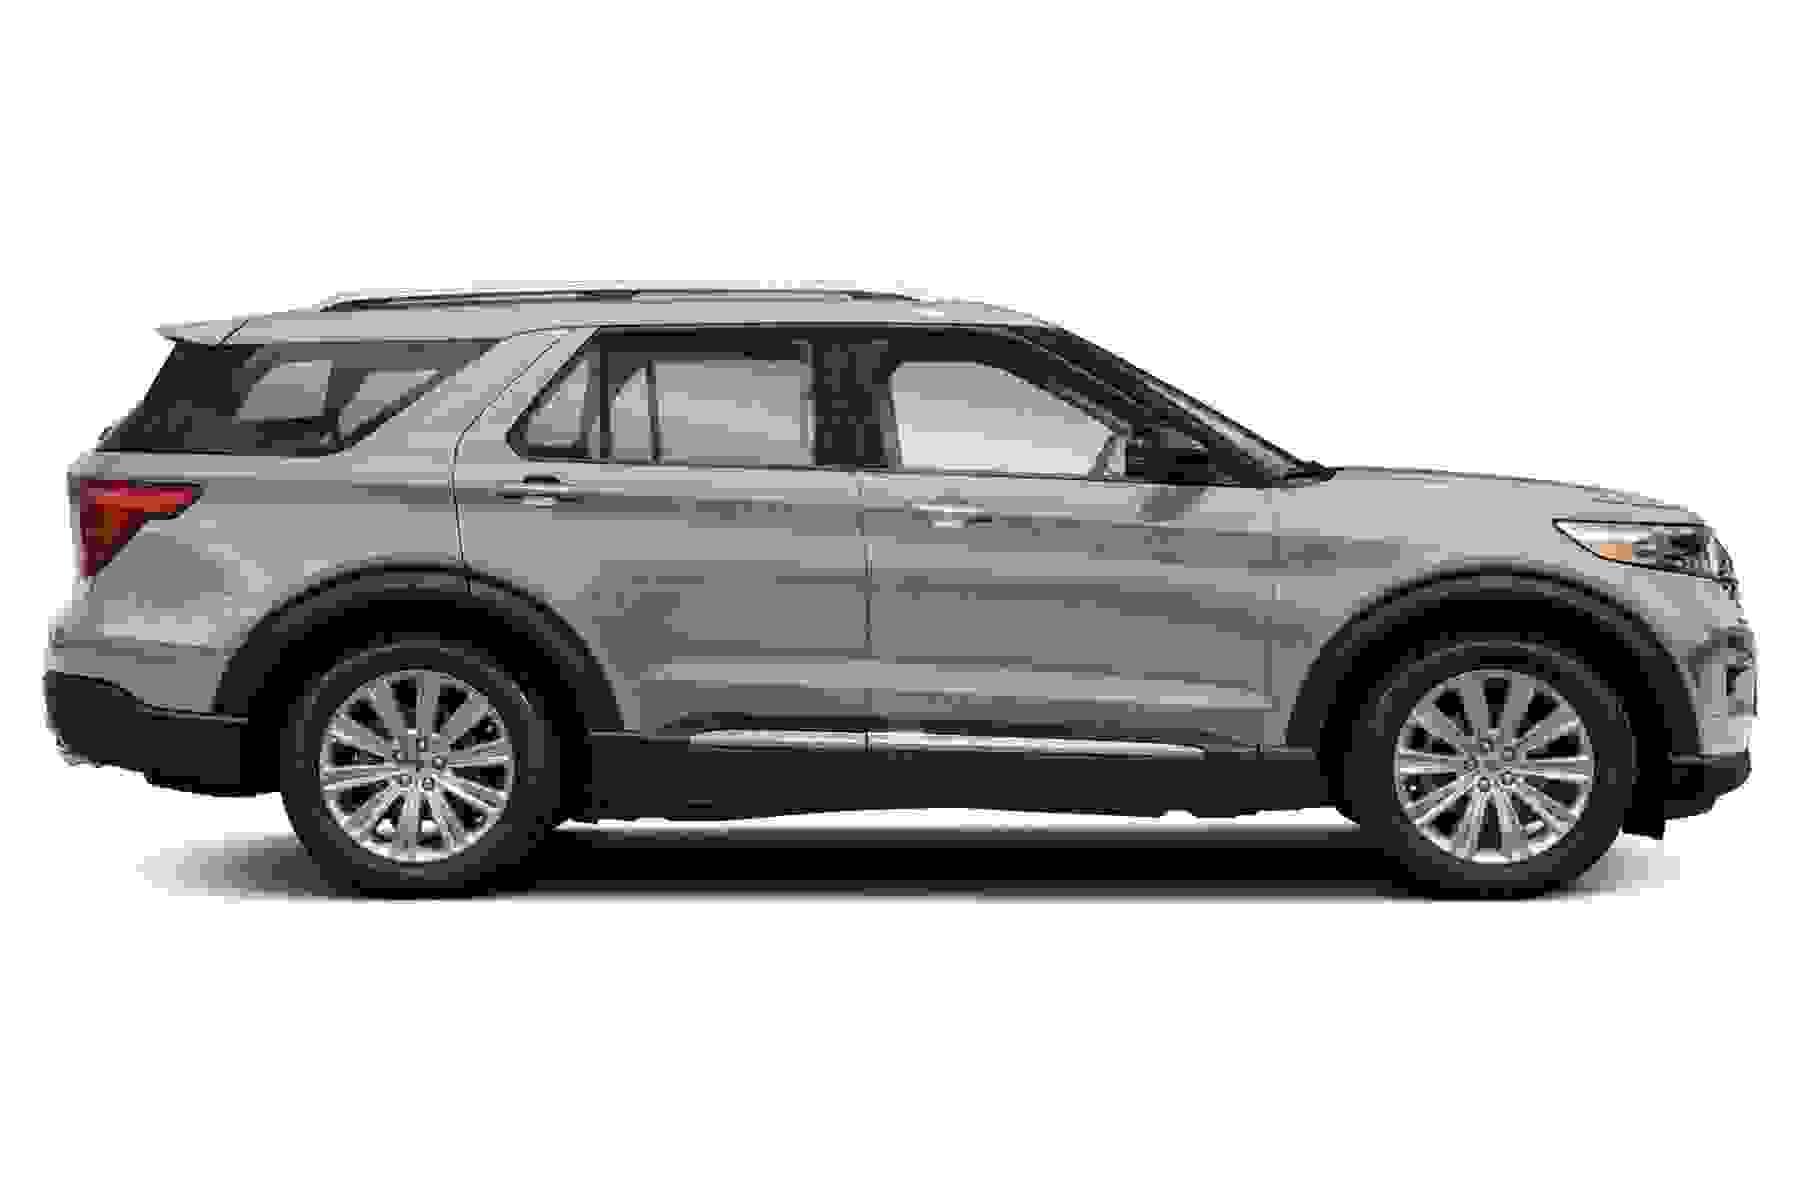 2020-ford-explorer-wheels